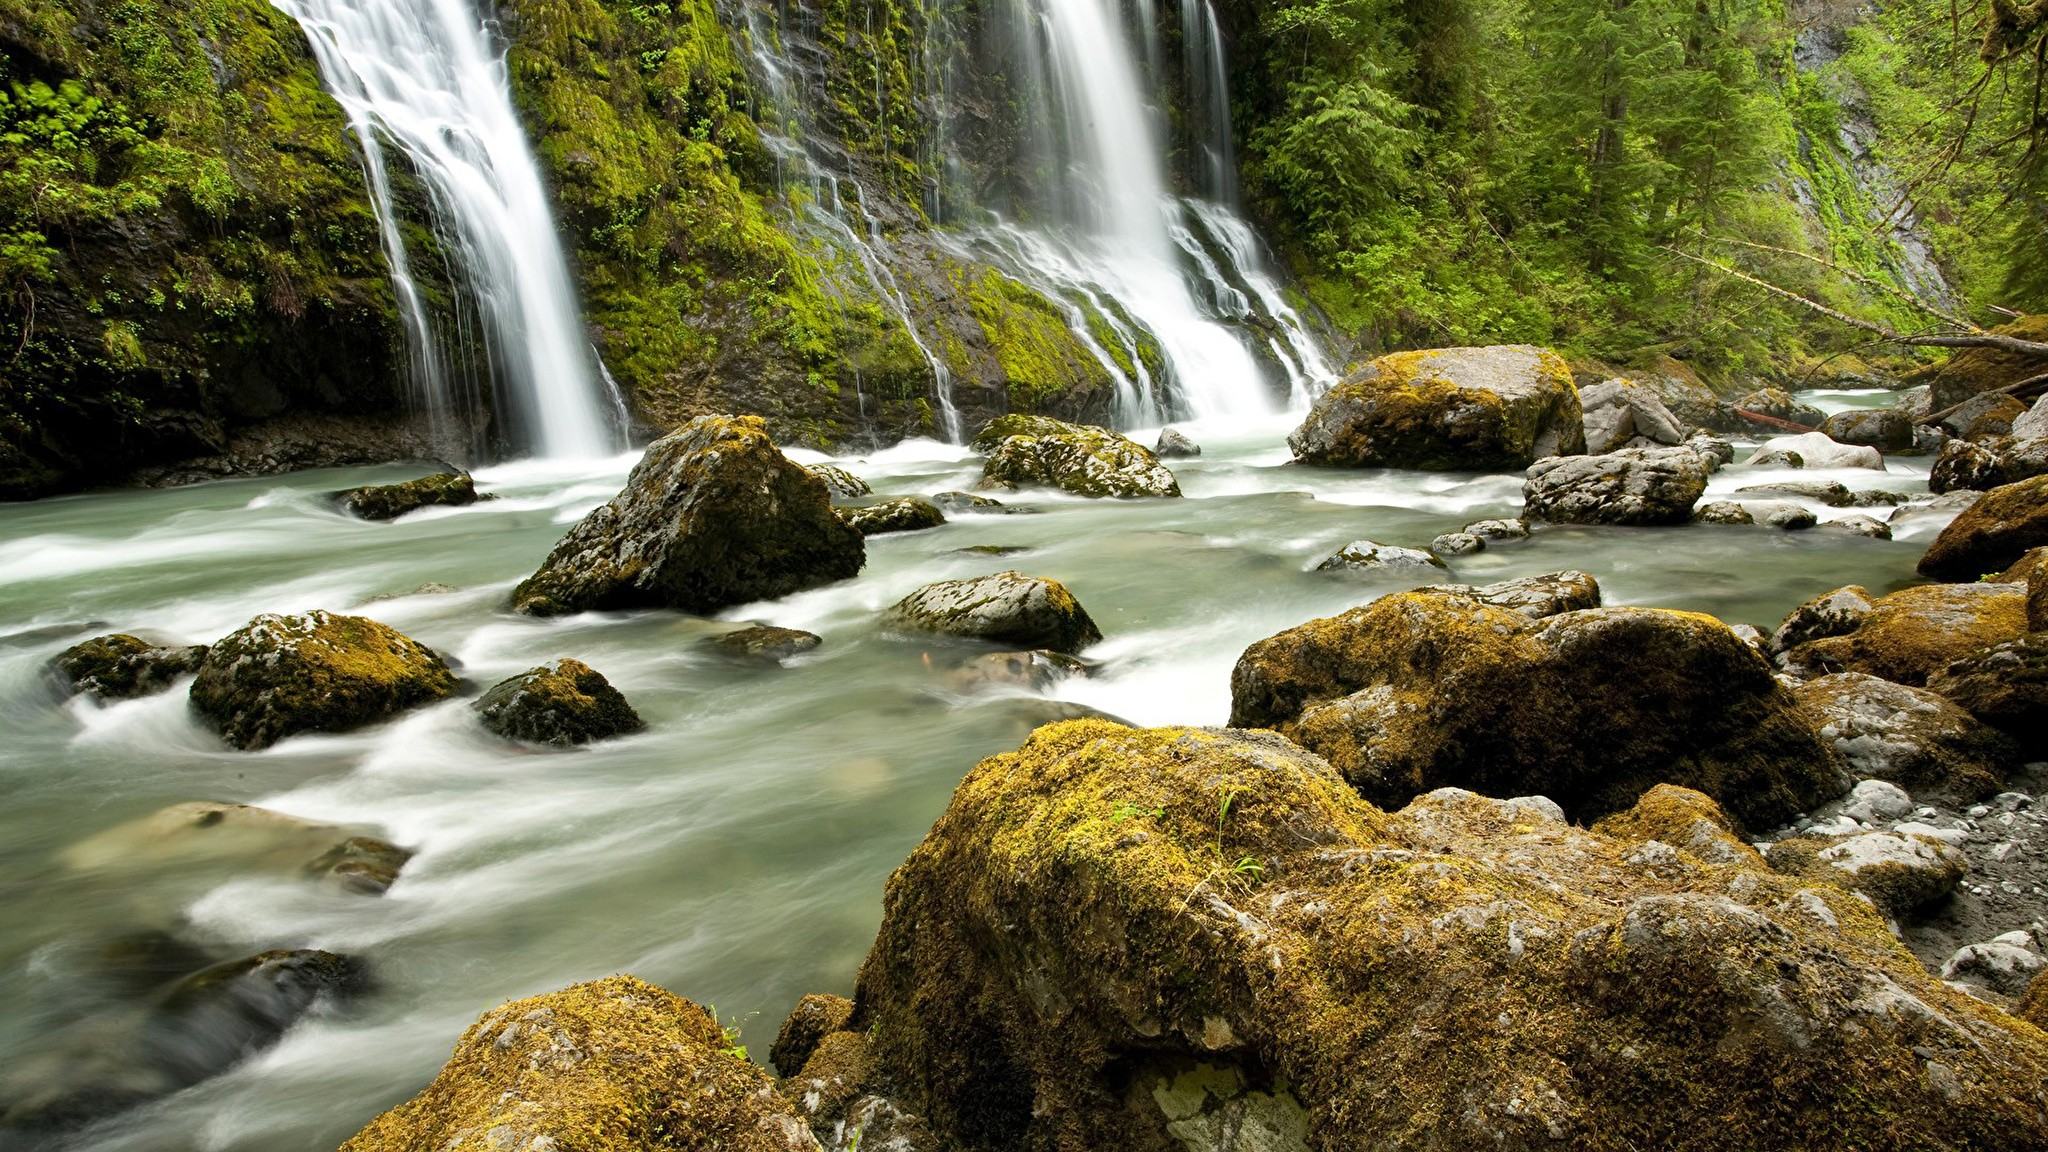 Waterfall good background